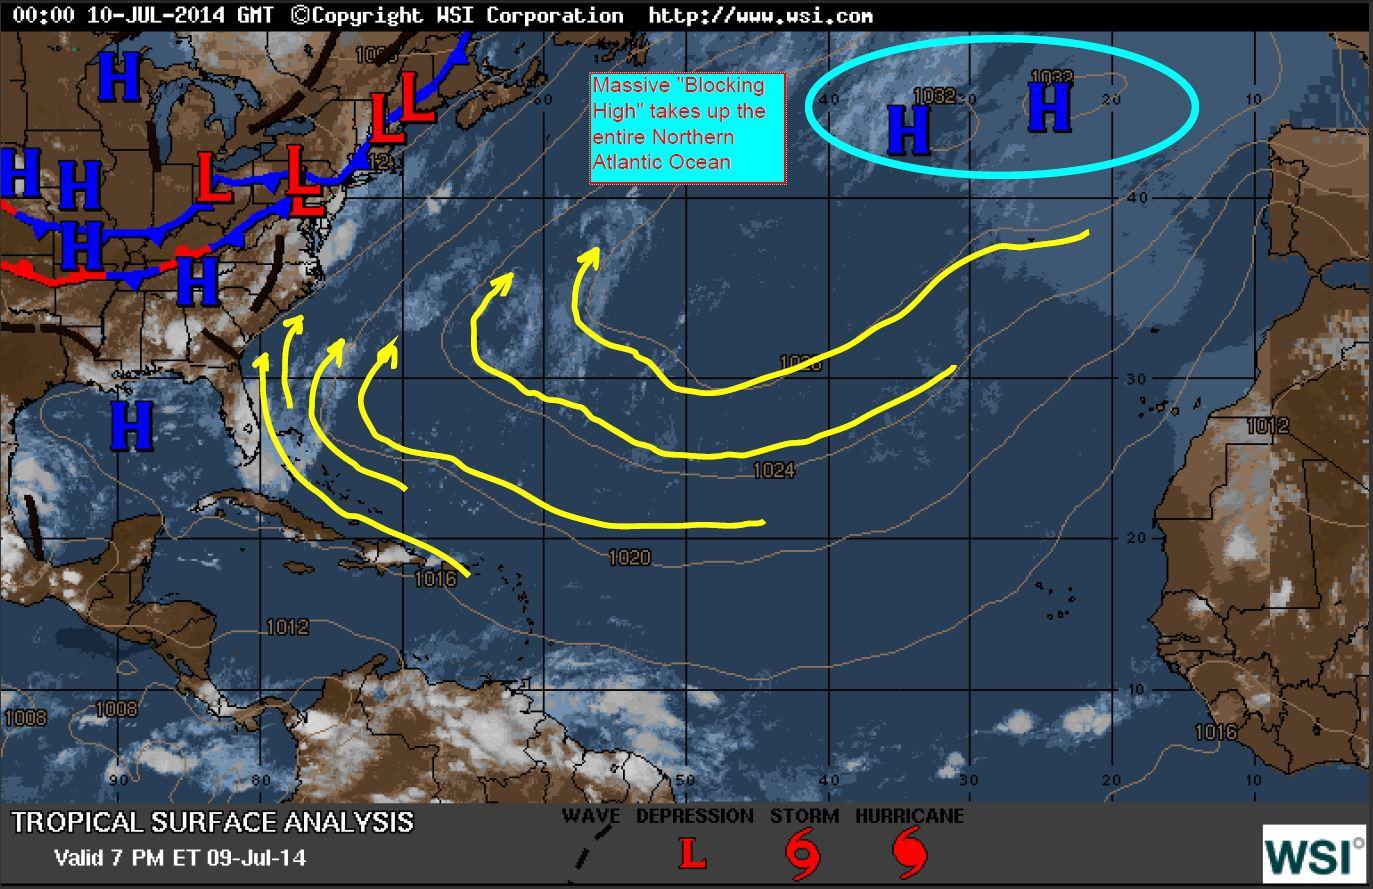 Bermuda-Azores High Reigns in July. – Blog.WeatherFlow.com